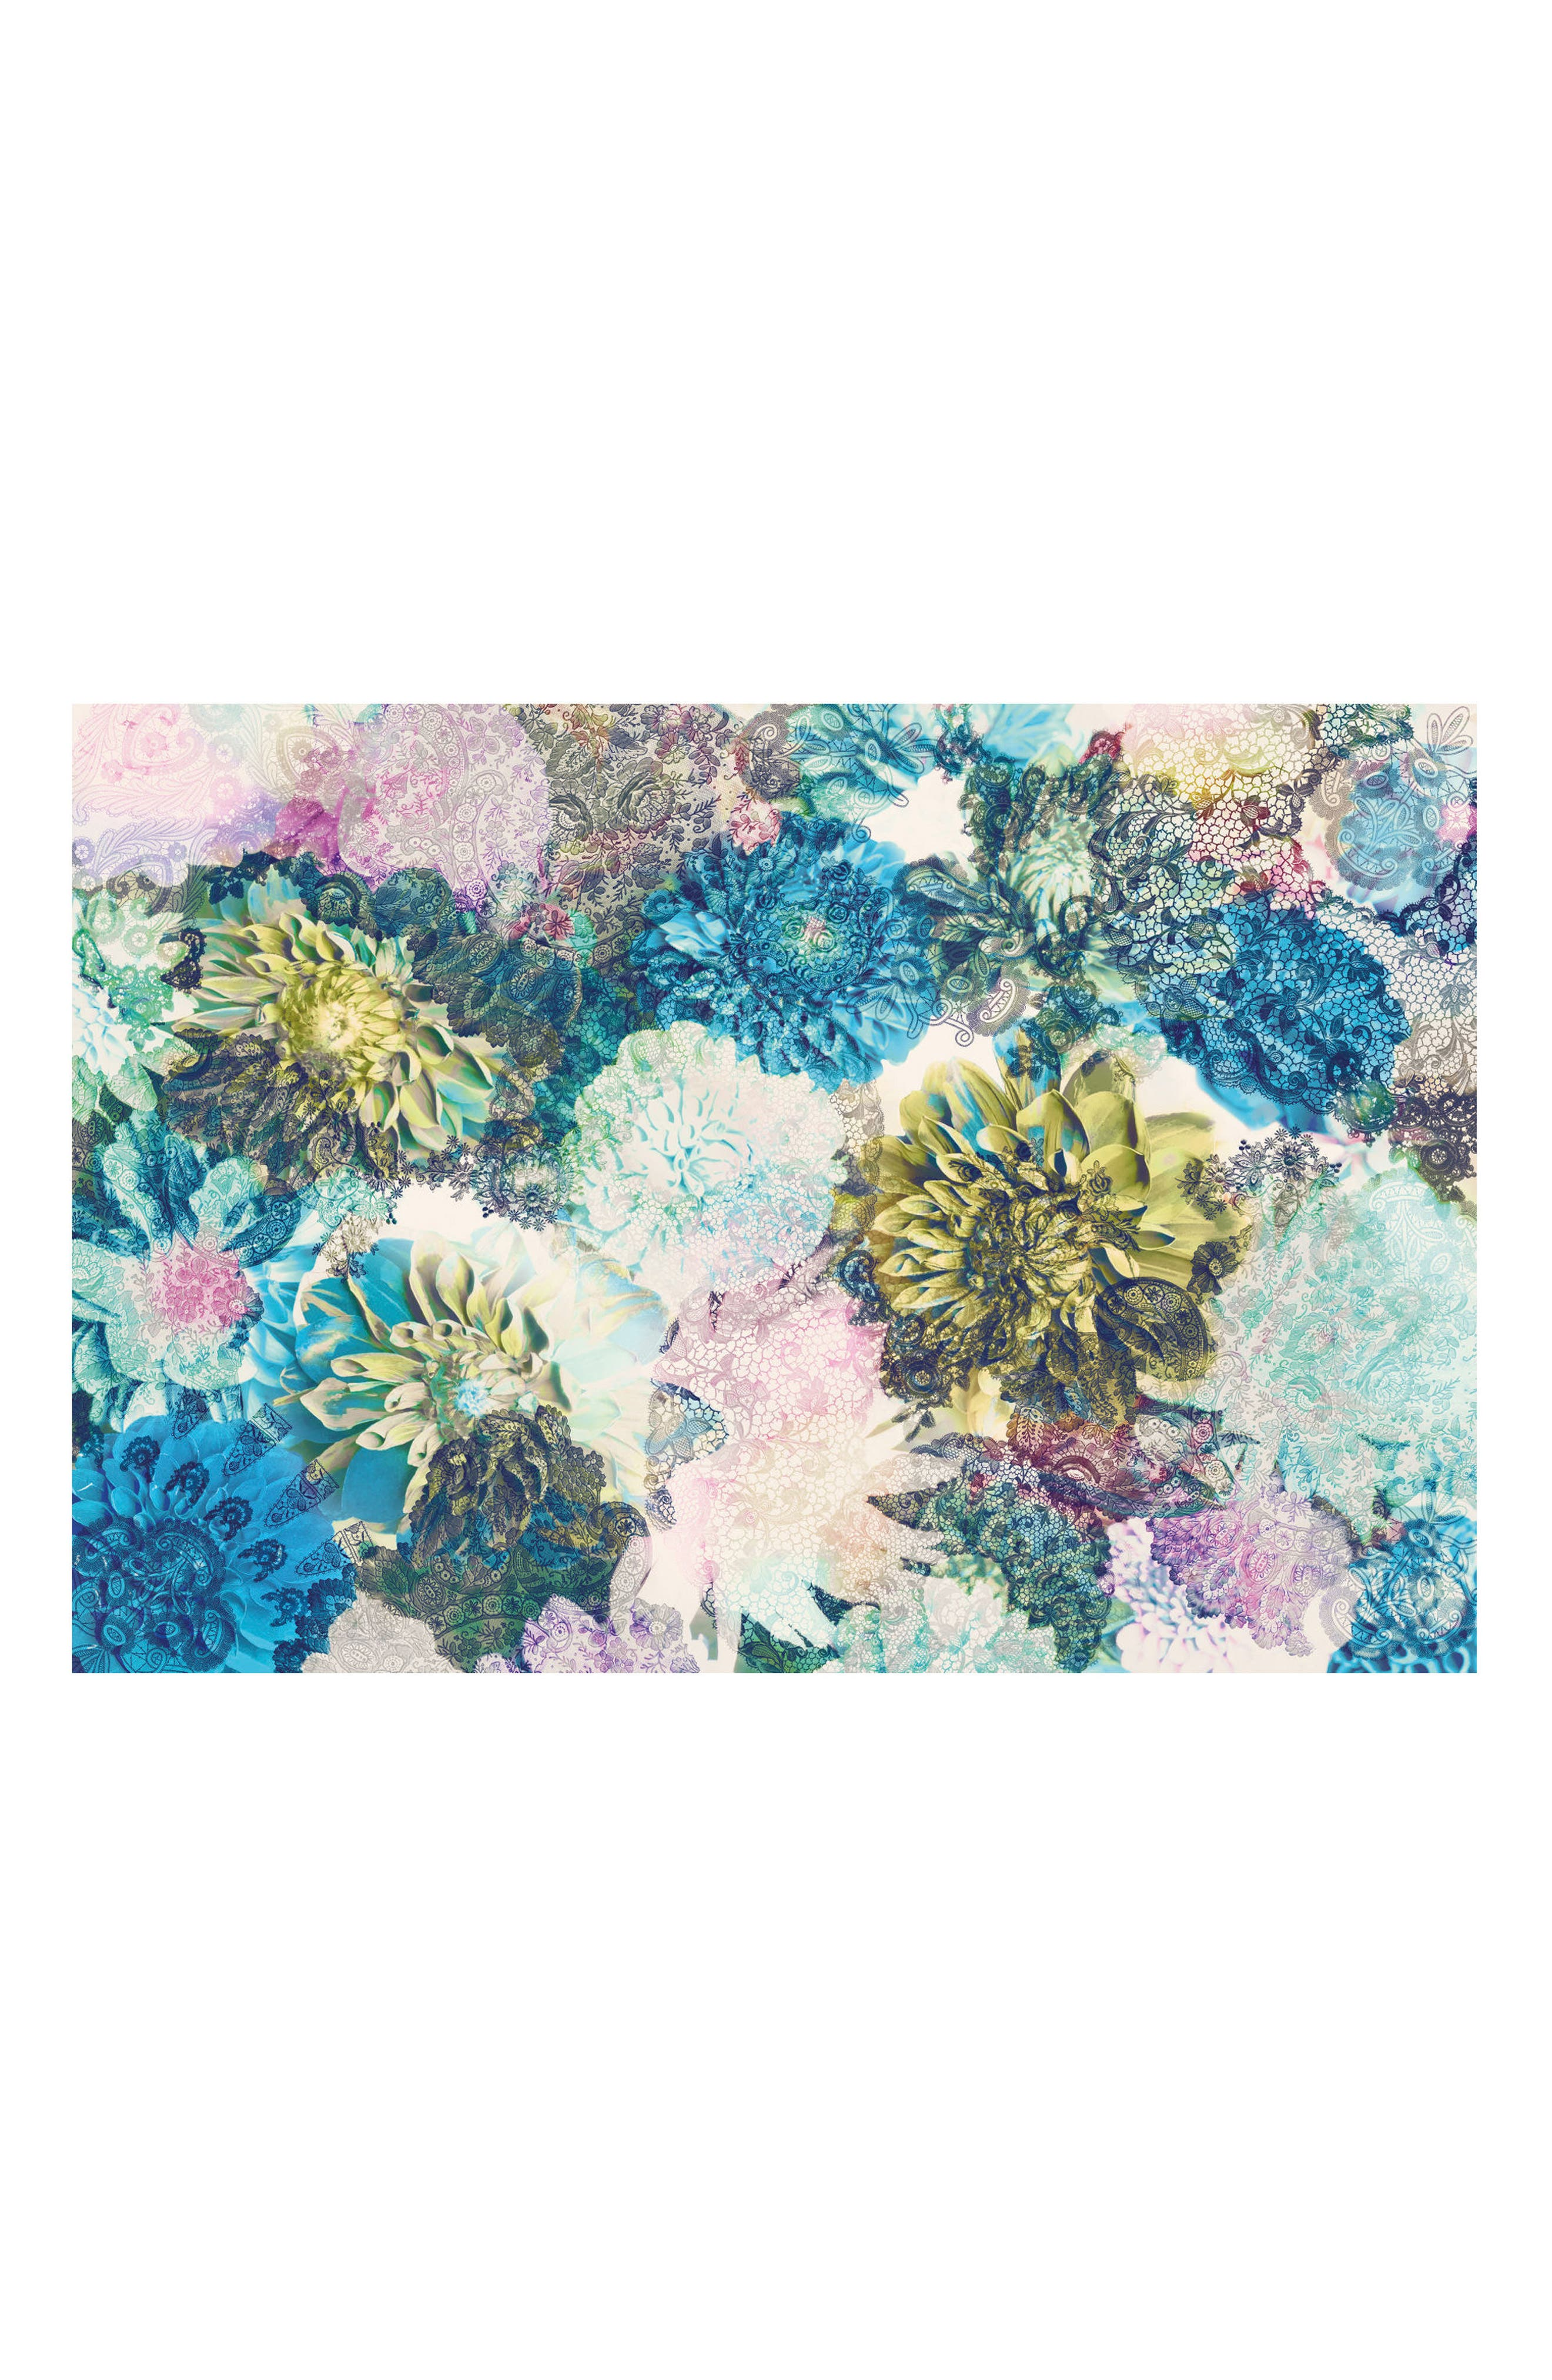 Frisky Flowers Wall Mural,                             Main thumbnail 1, color,                             400